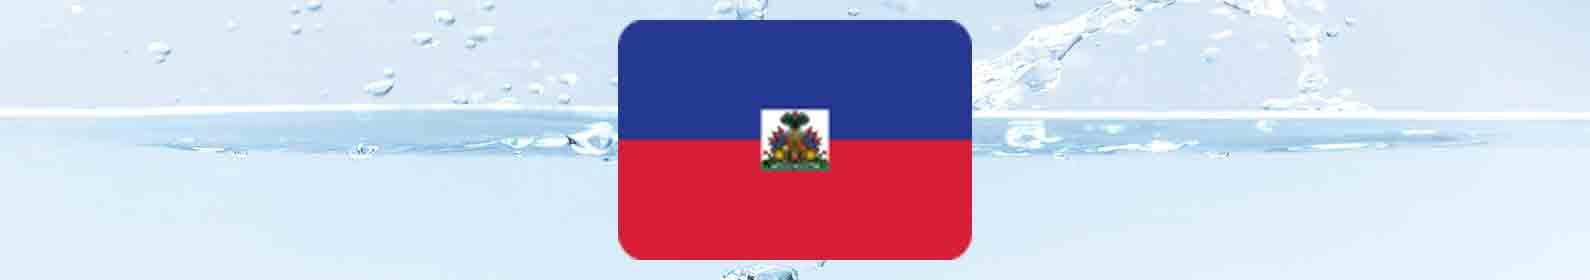 water-treatment-haiti.jpg